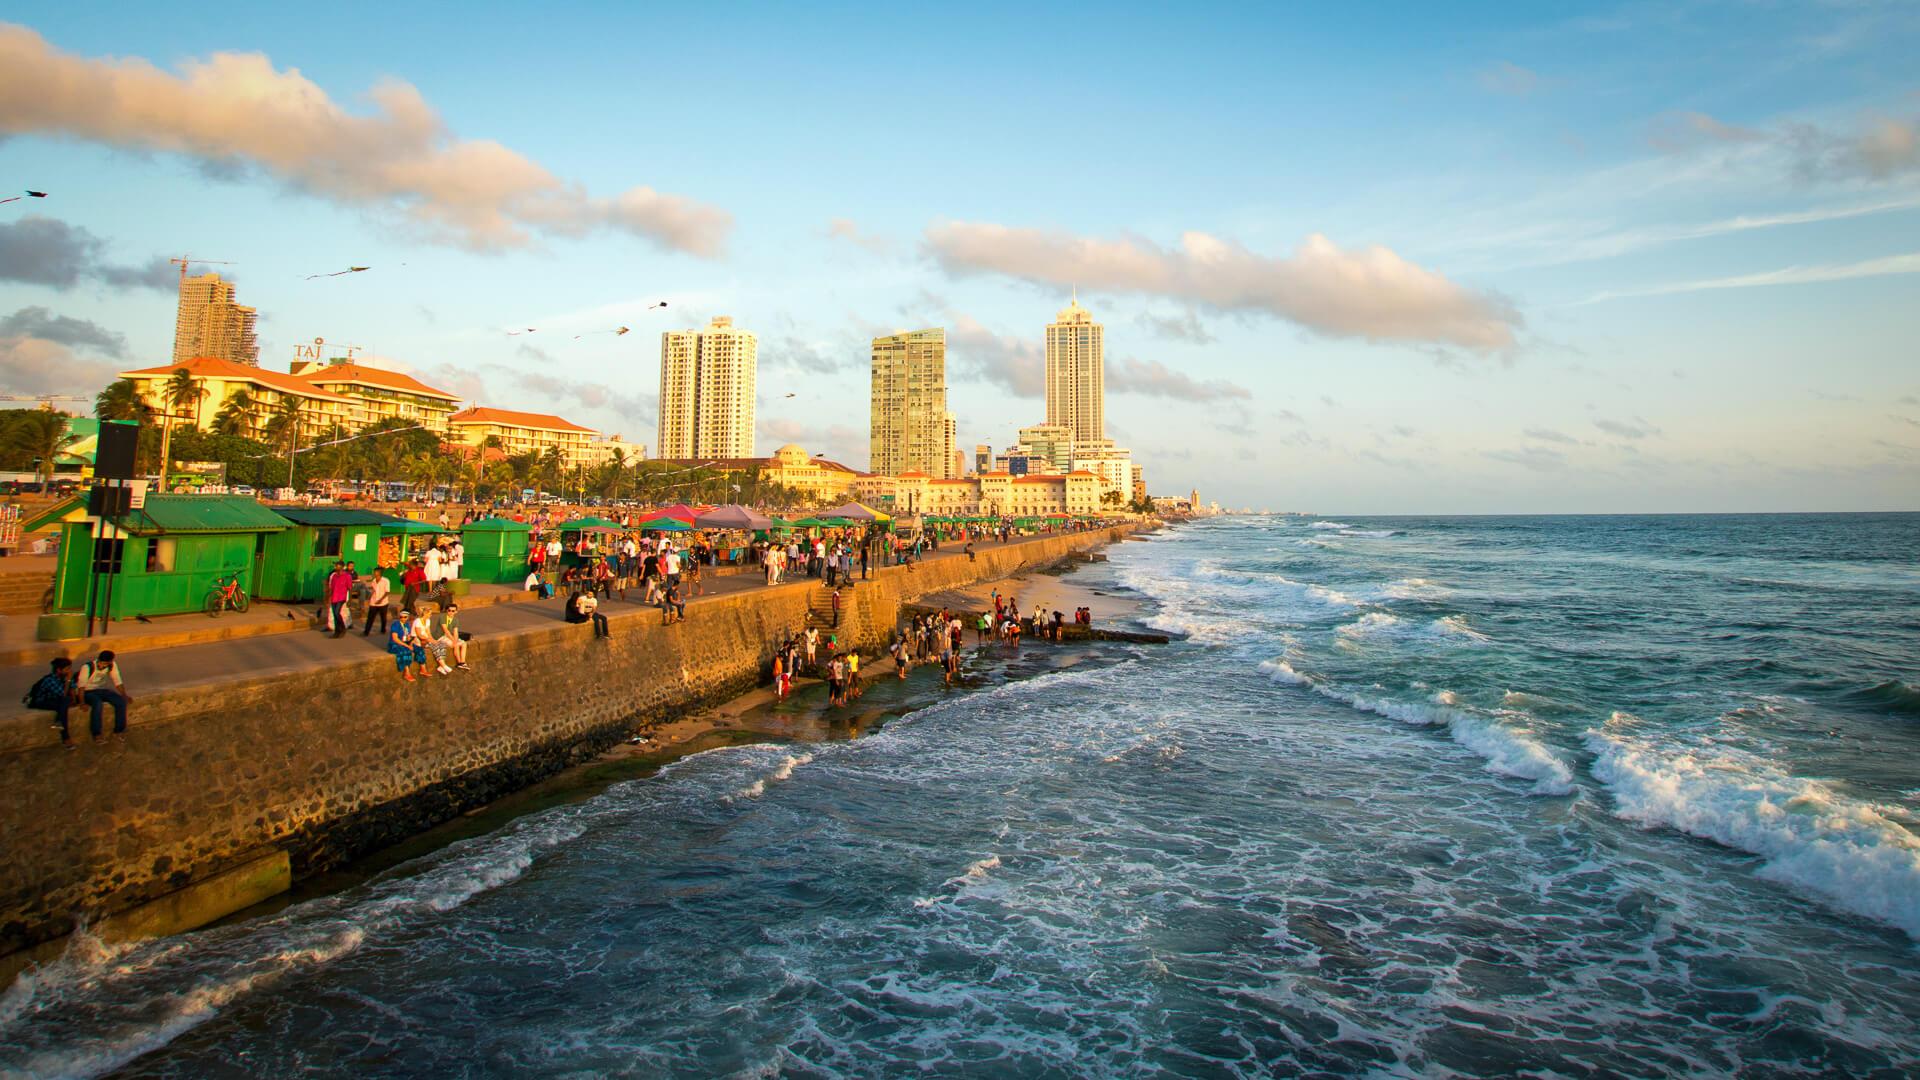 Galle Face Green ocean view in Colombo Sri Lanka